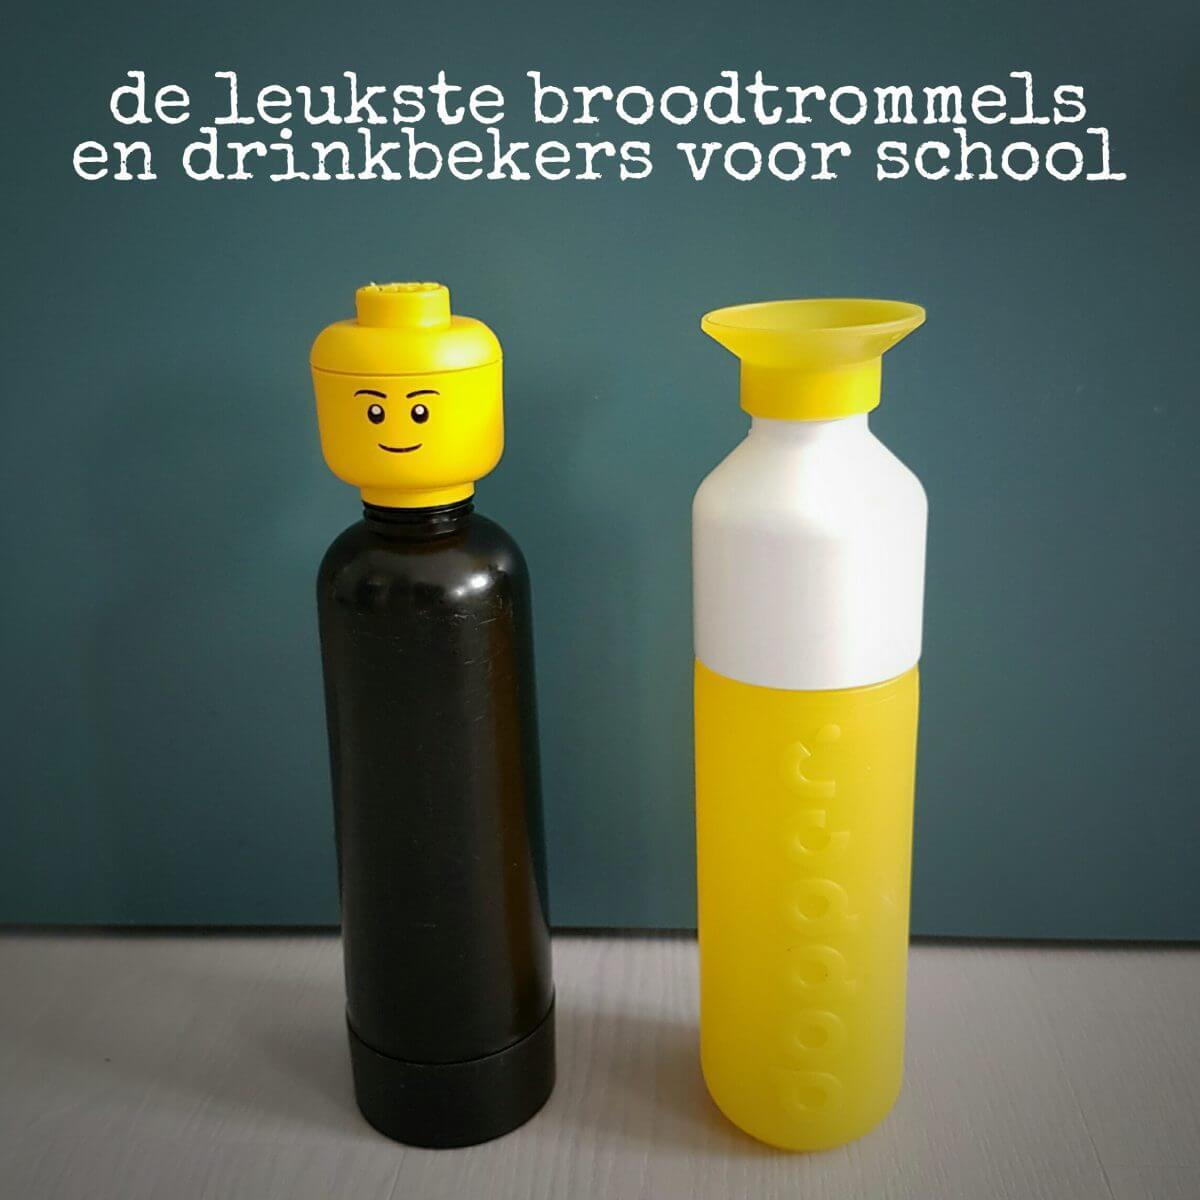 De leukste broodtrommels en drinkbekers voor school - lego en dopper